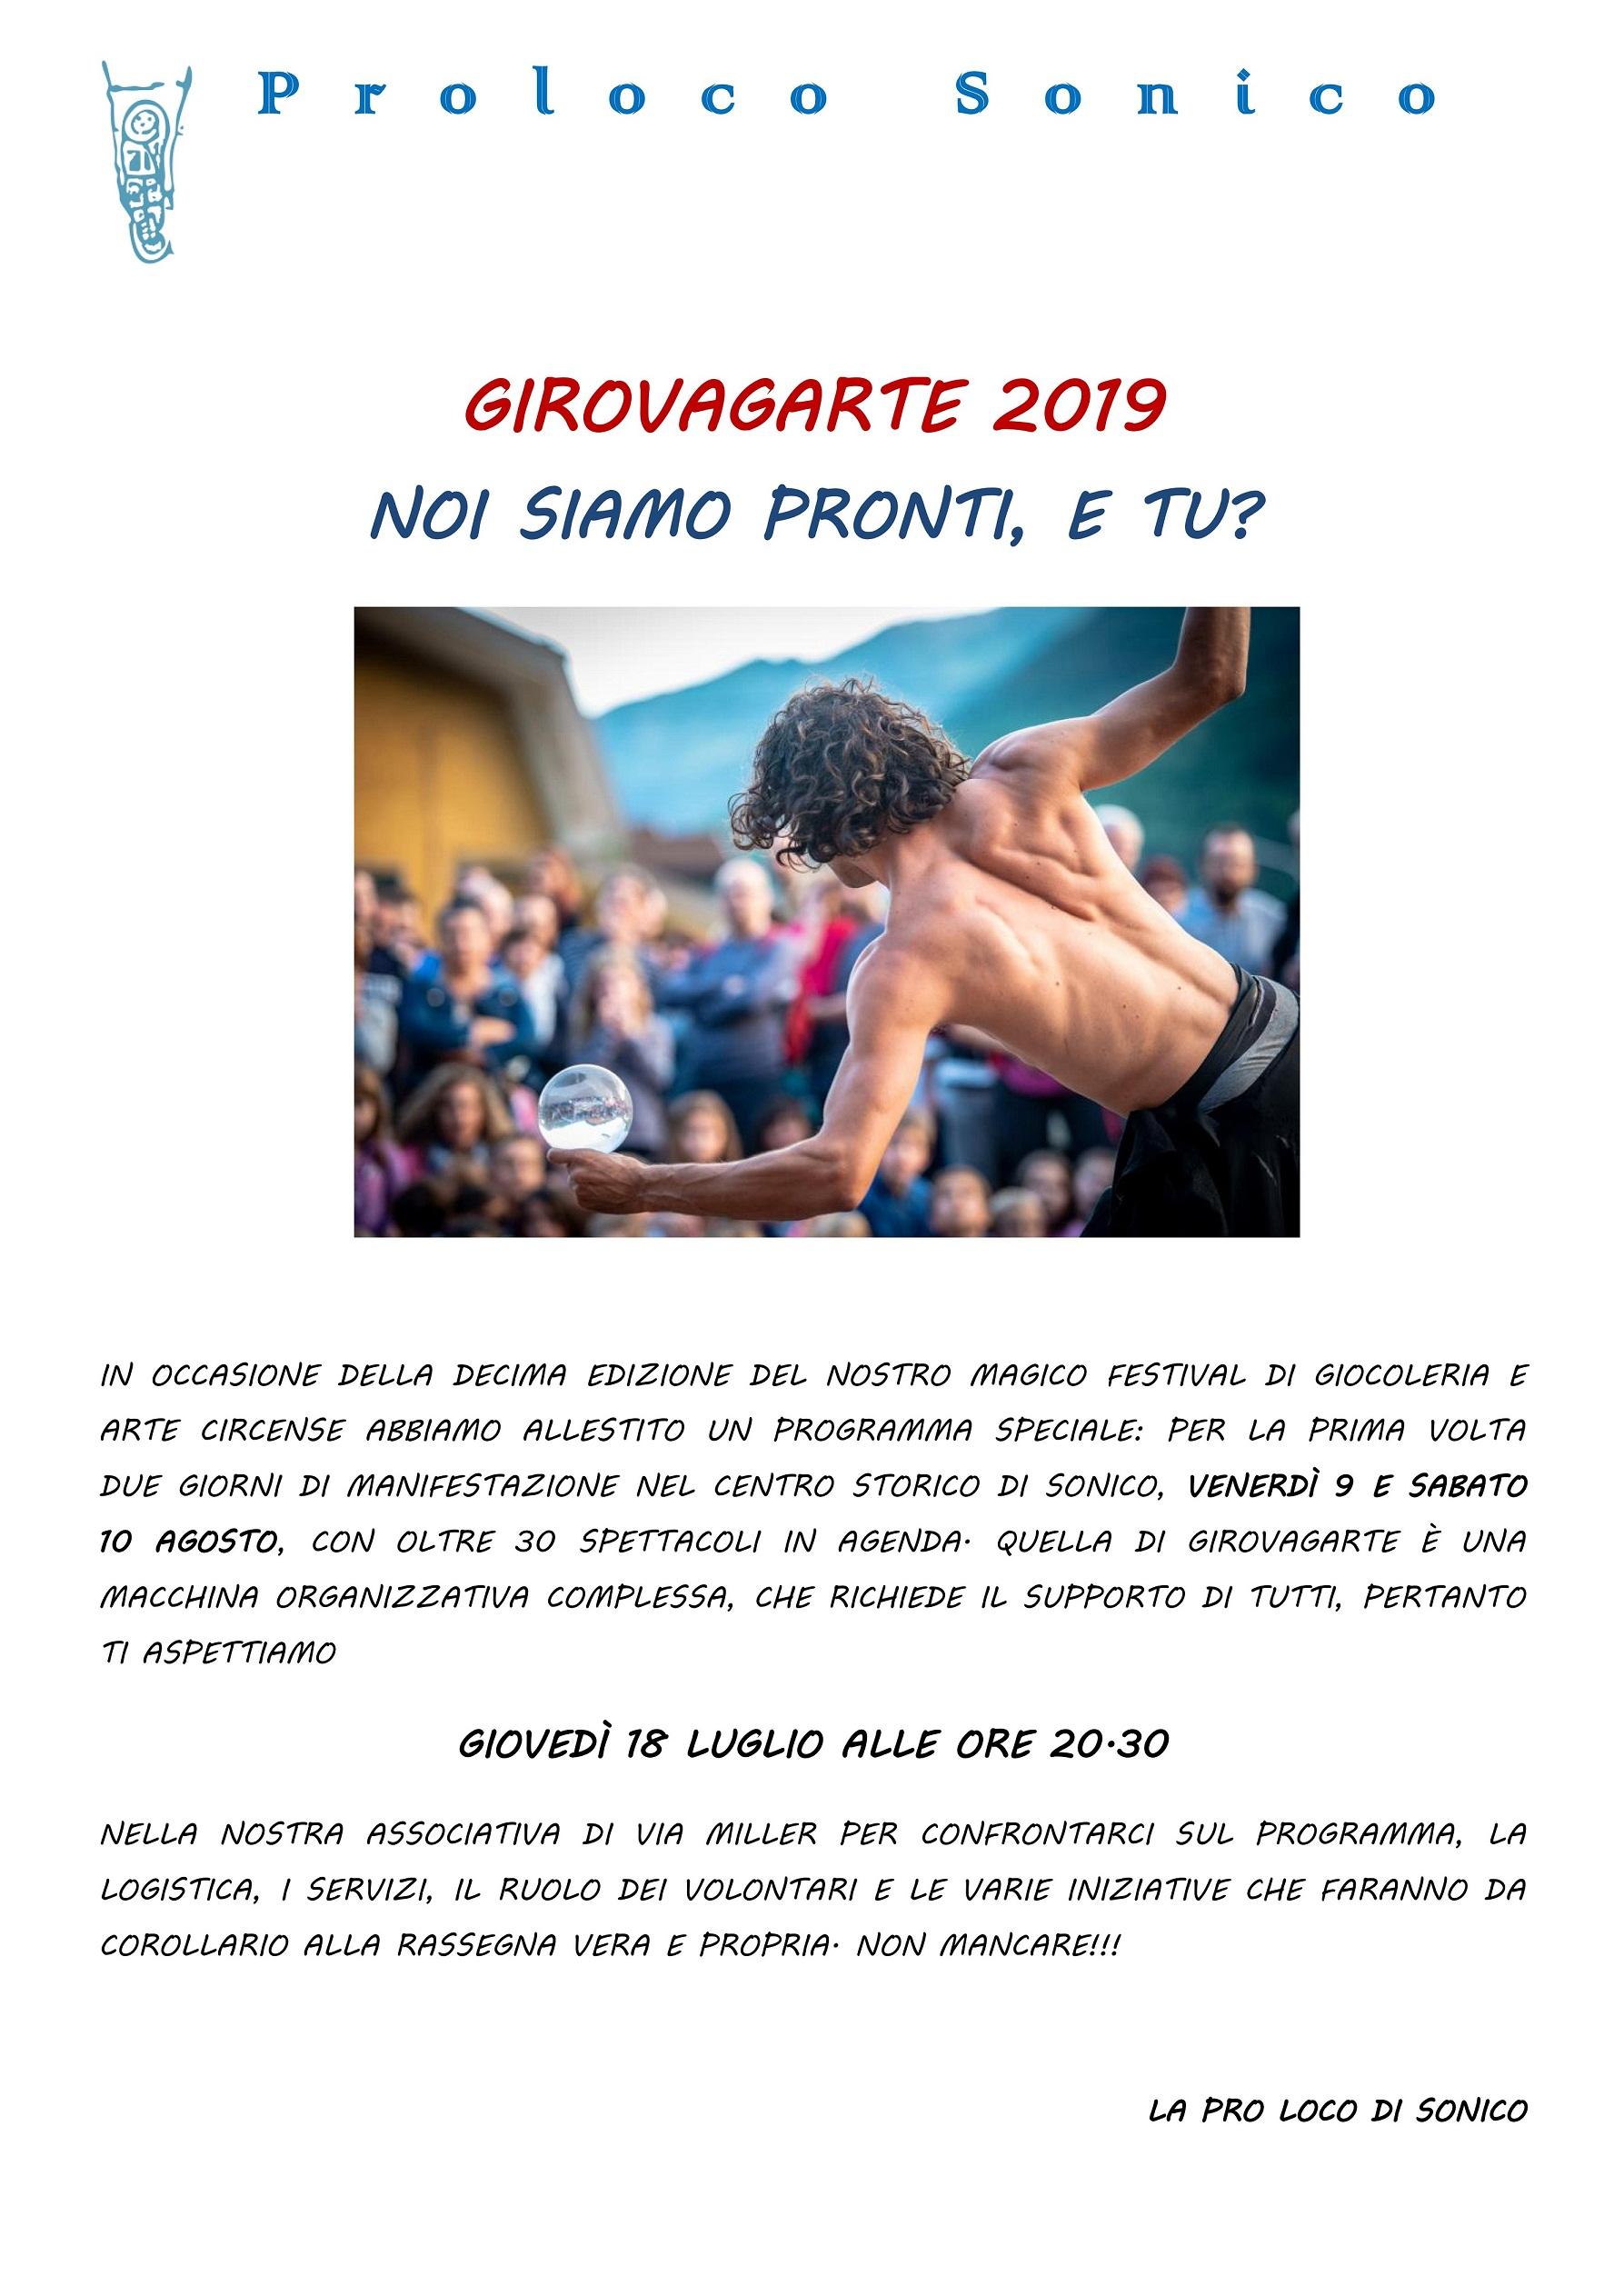 AVVISO IMPORTANTE GirovagArte 2019